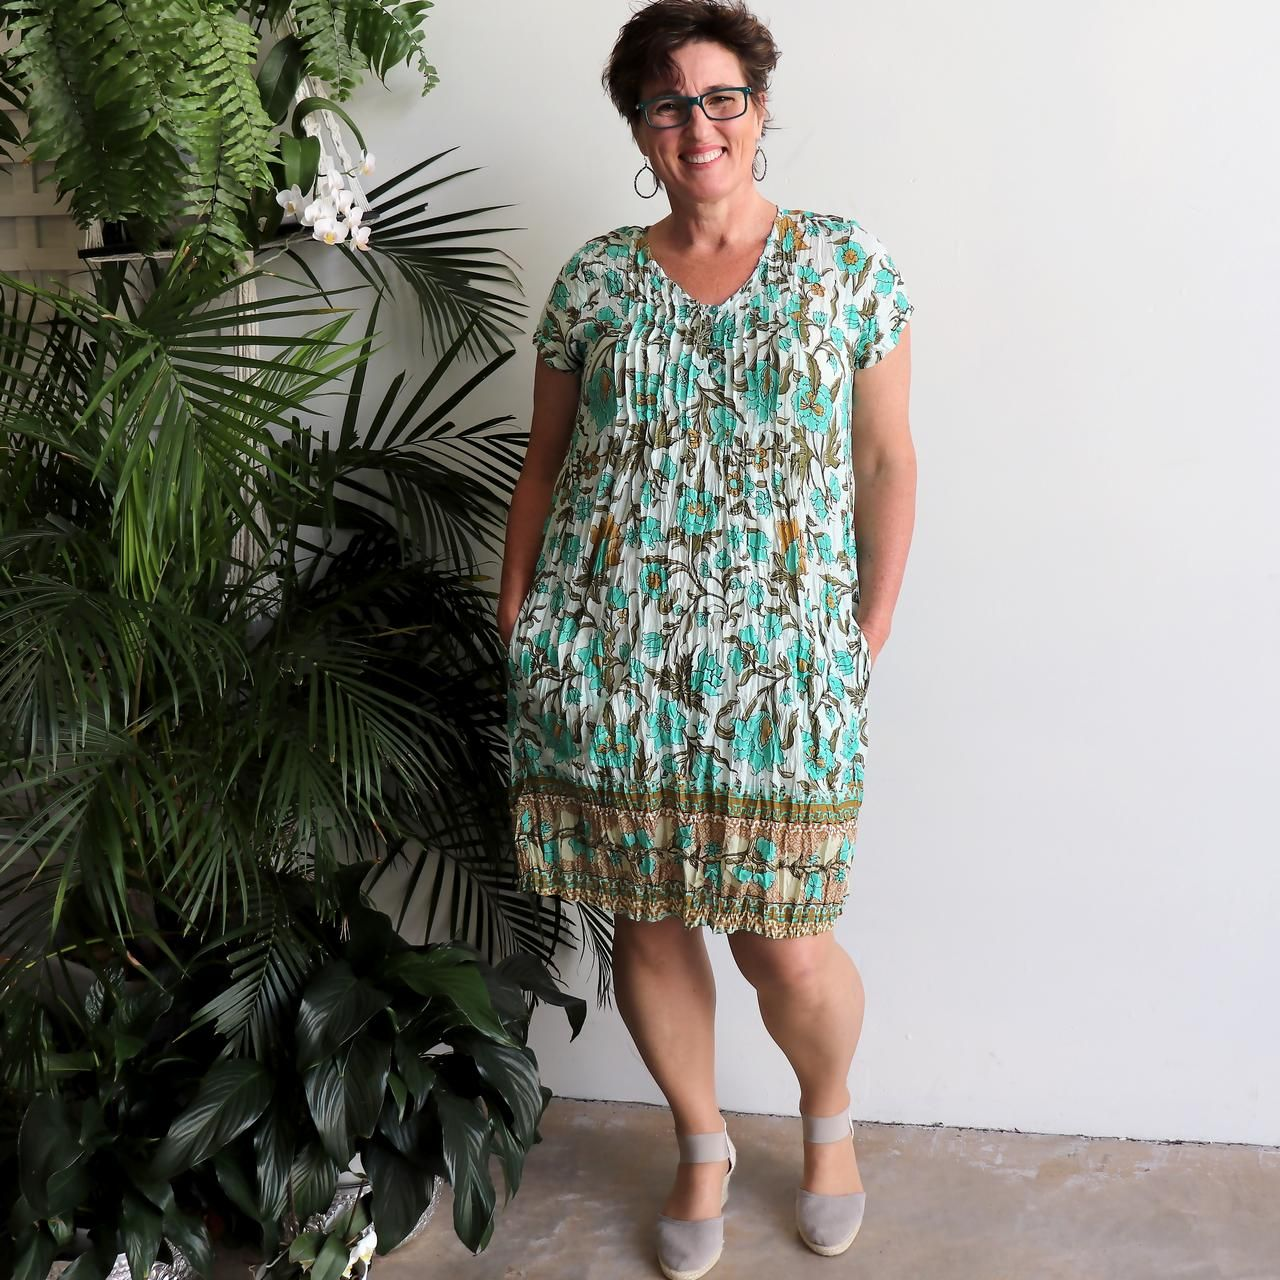 The One Summer Tunic Dress Summer Tunic Dress Dresses Tunic Dress [ 1280 x 1280 Pixel ]